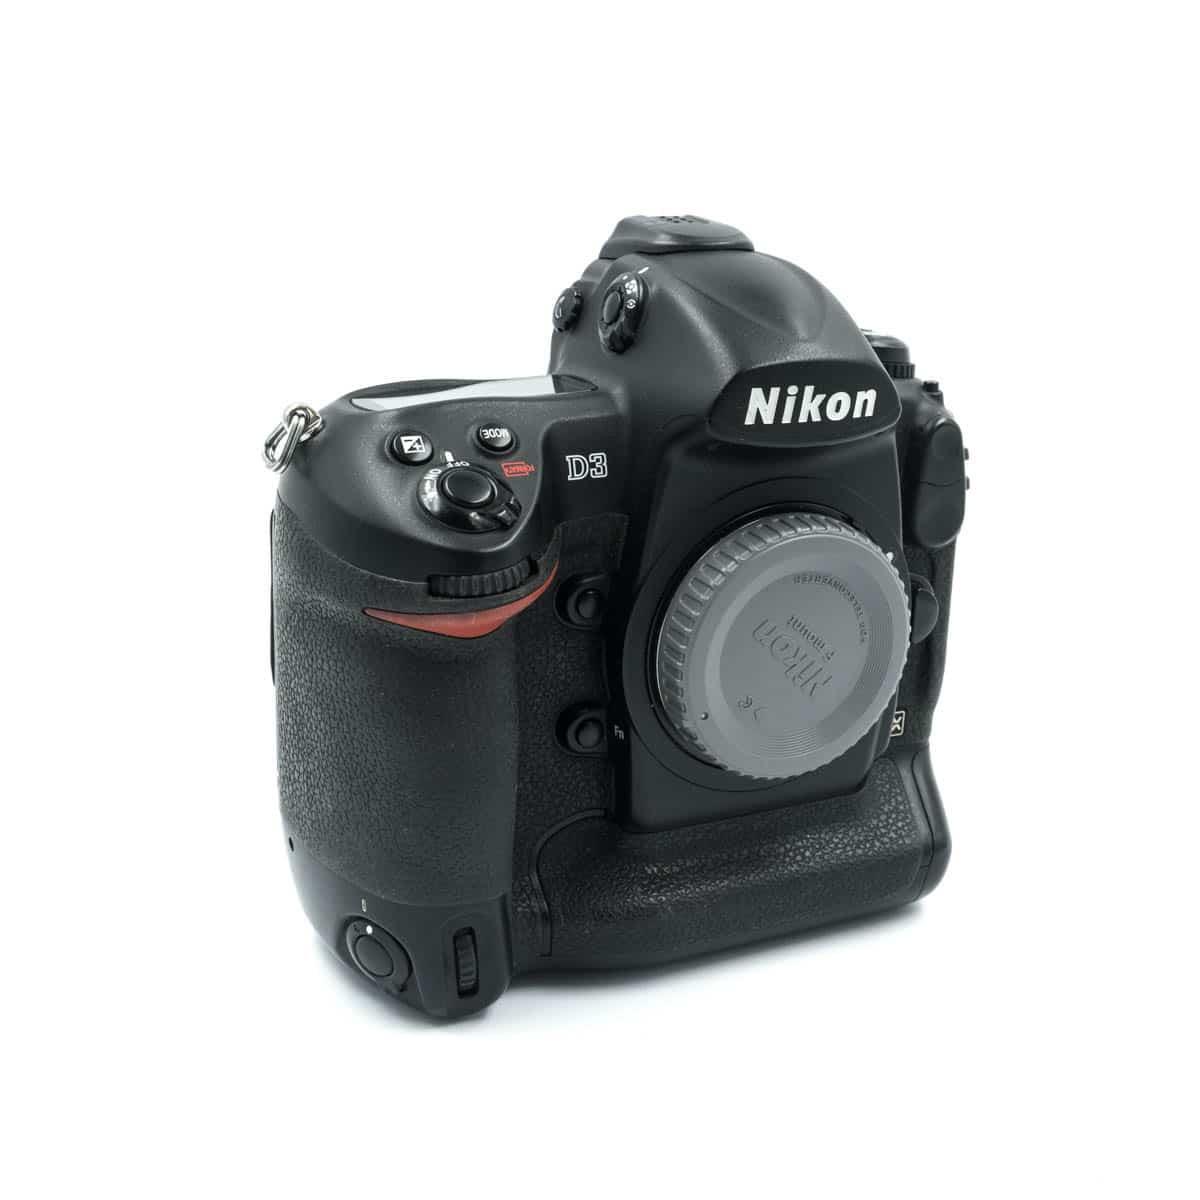 Sigma 17-50mm f/2.8 EX DC OS HSM NIKON  – Käytetty